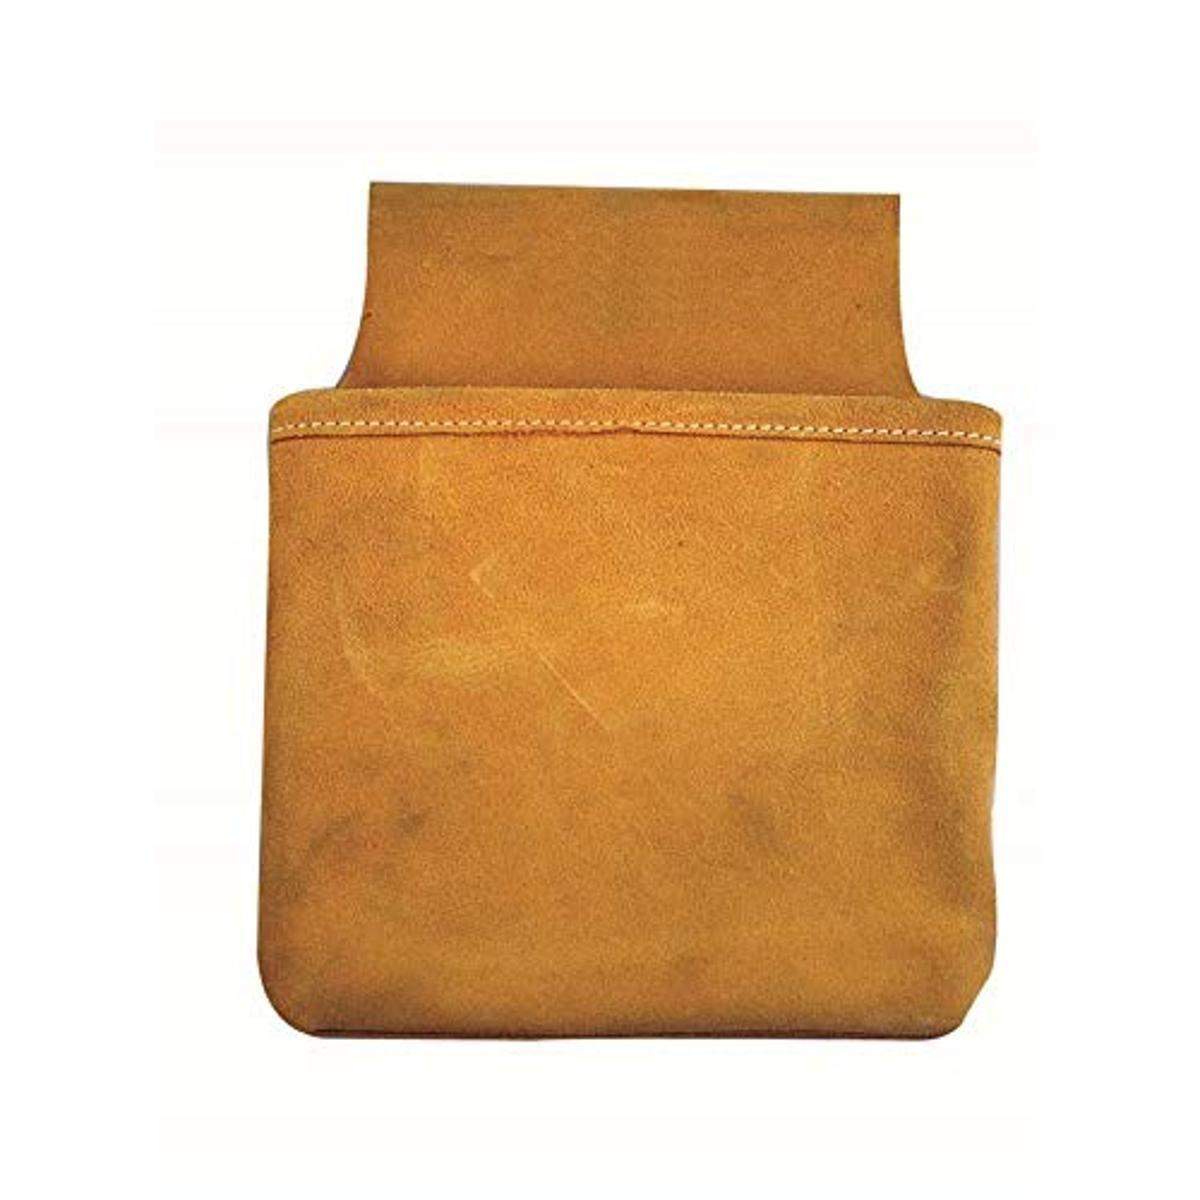 Bon Tool Co. 84-435 Pocket Bag El Paso Mall Boston Mall Nail 1